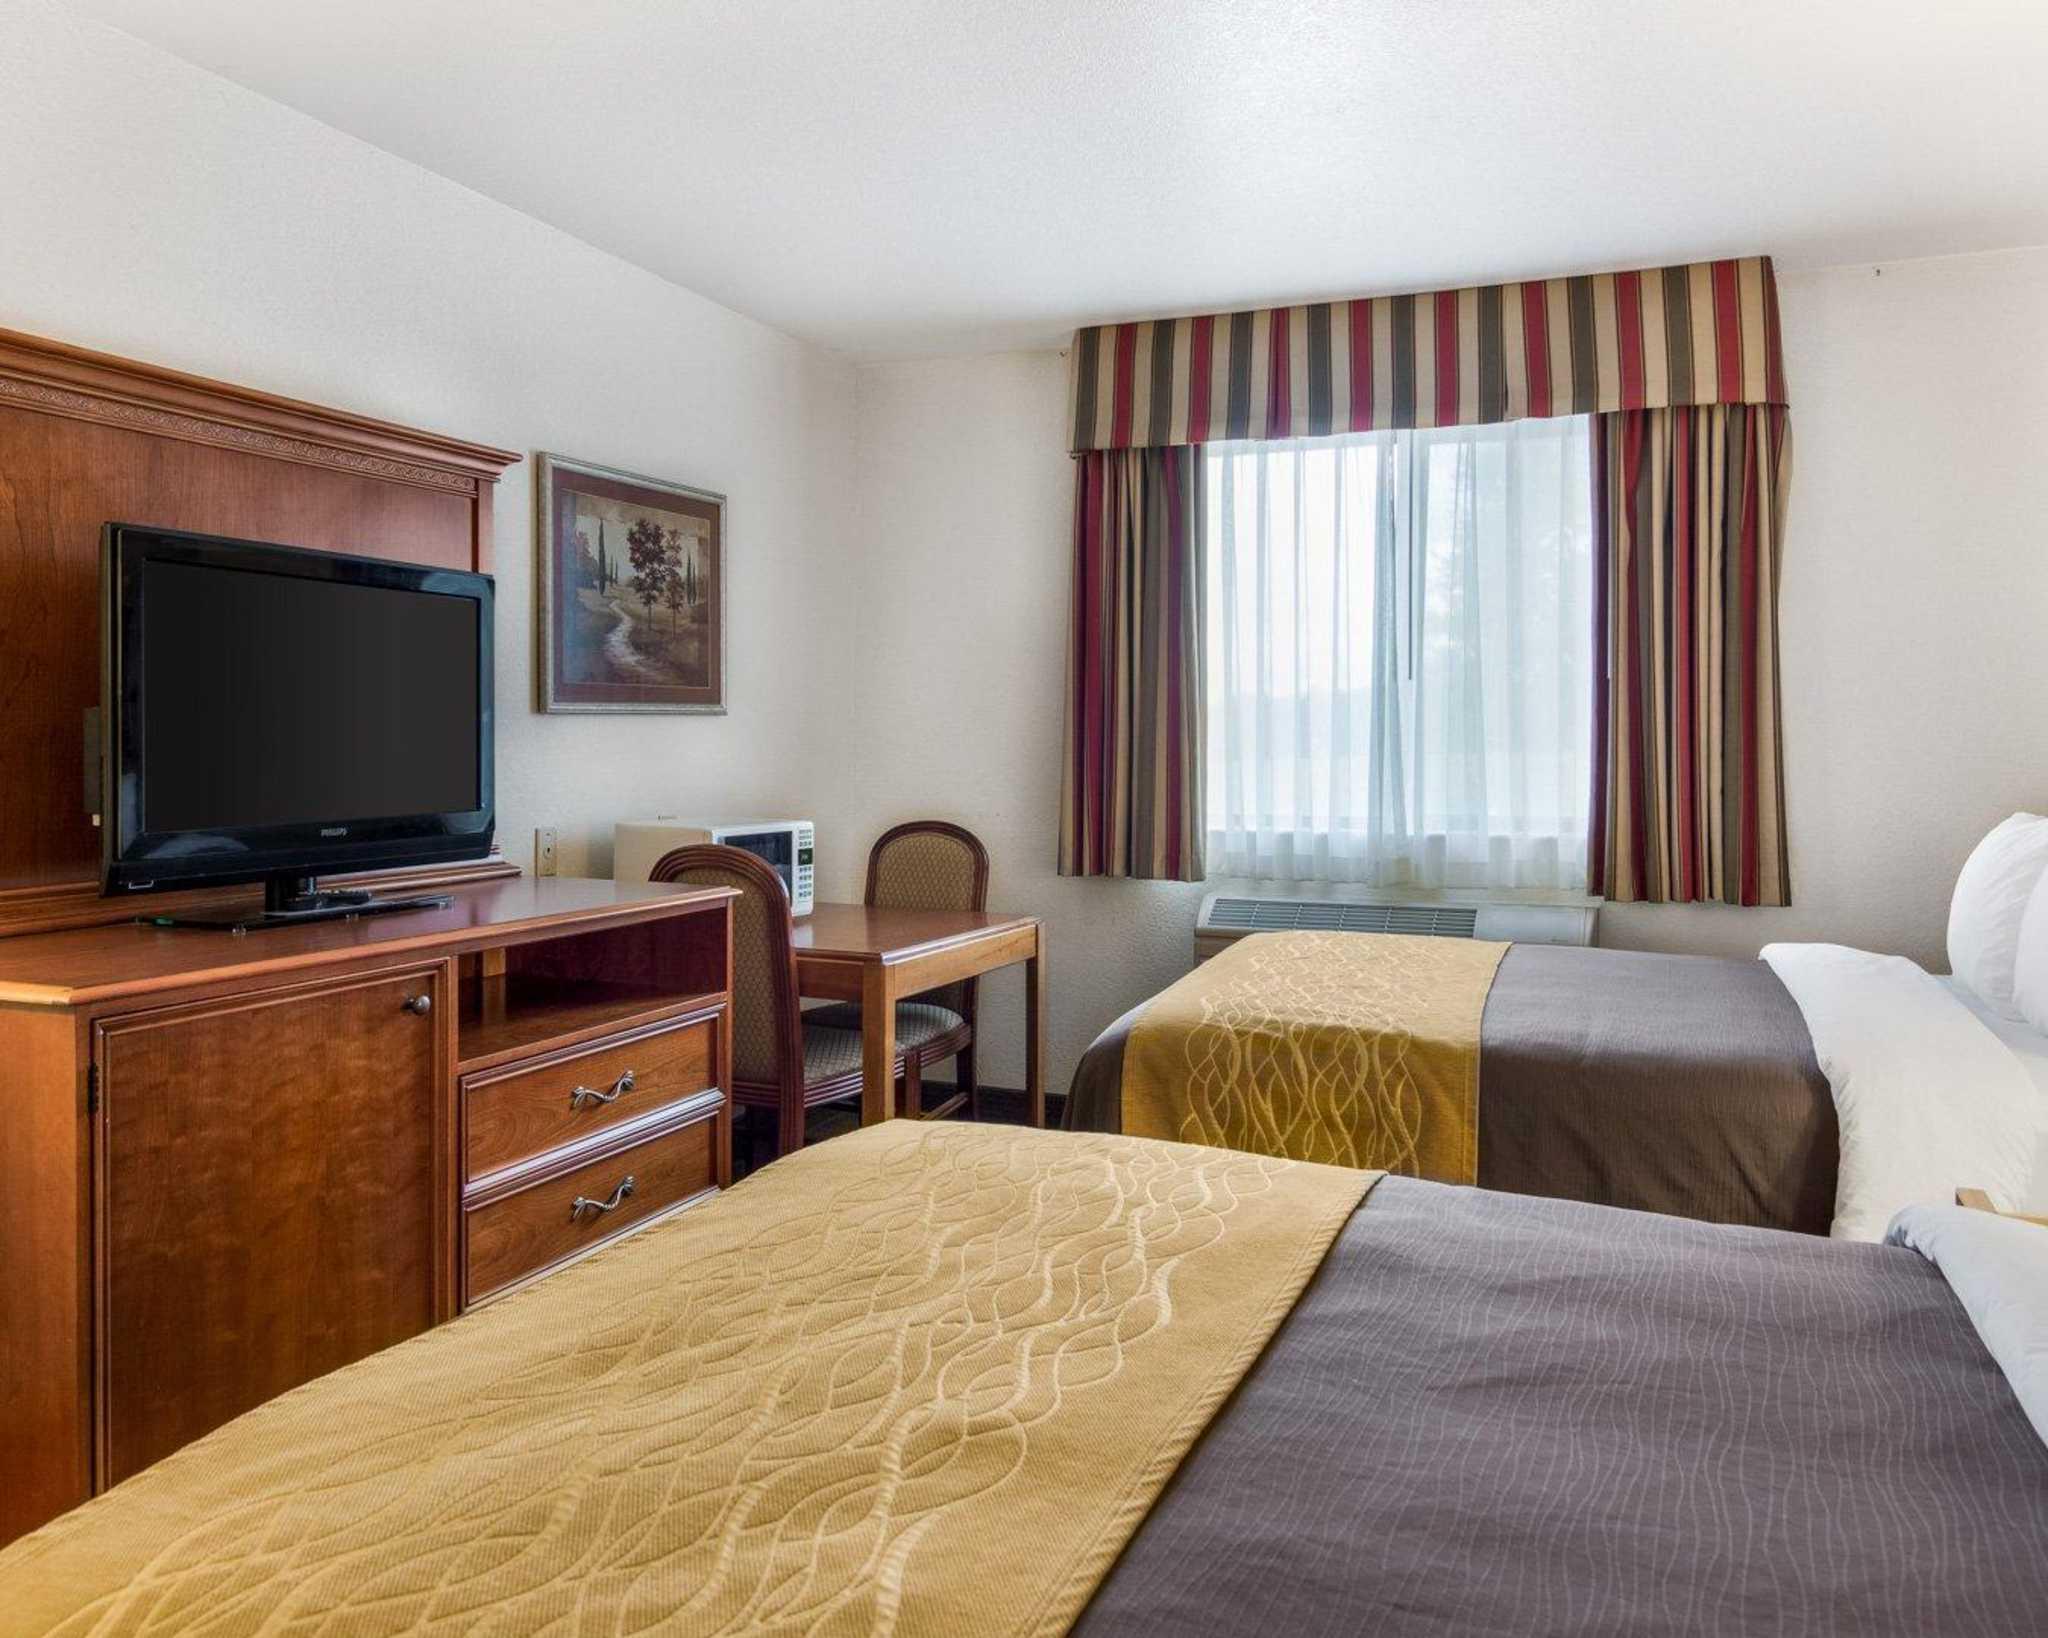 Comfort Inn & Suites image 10